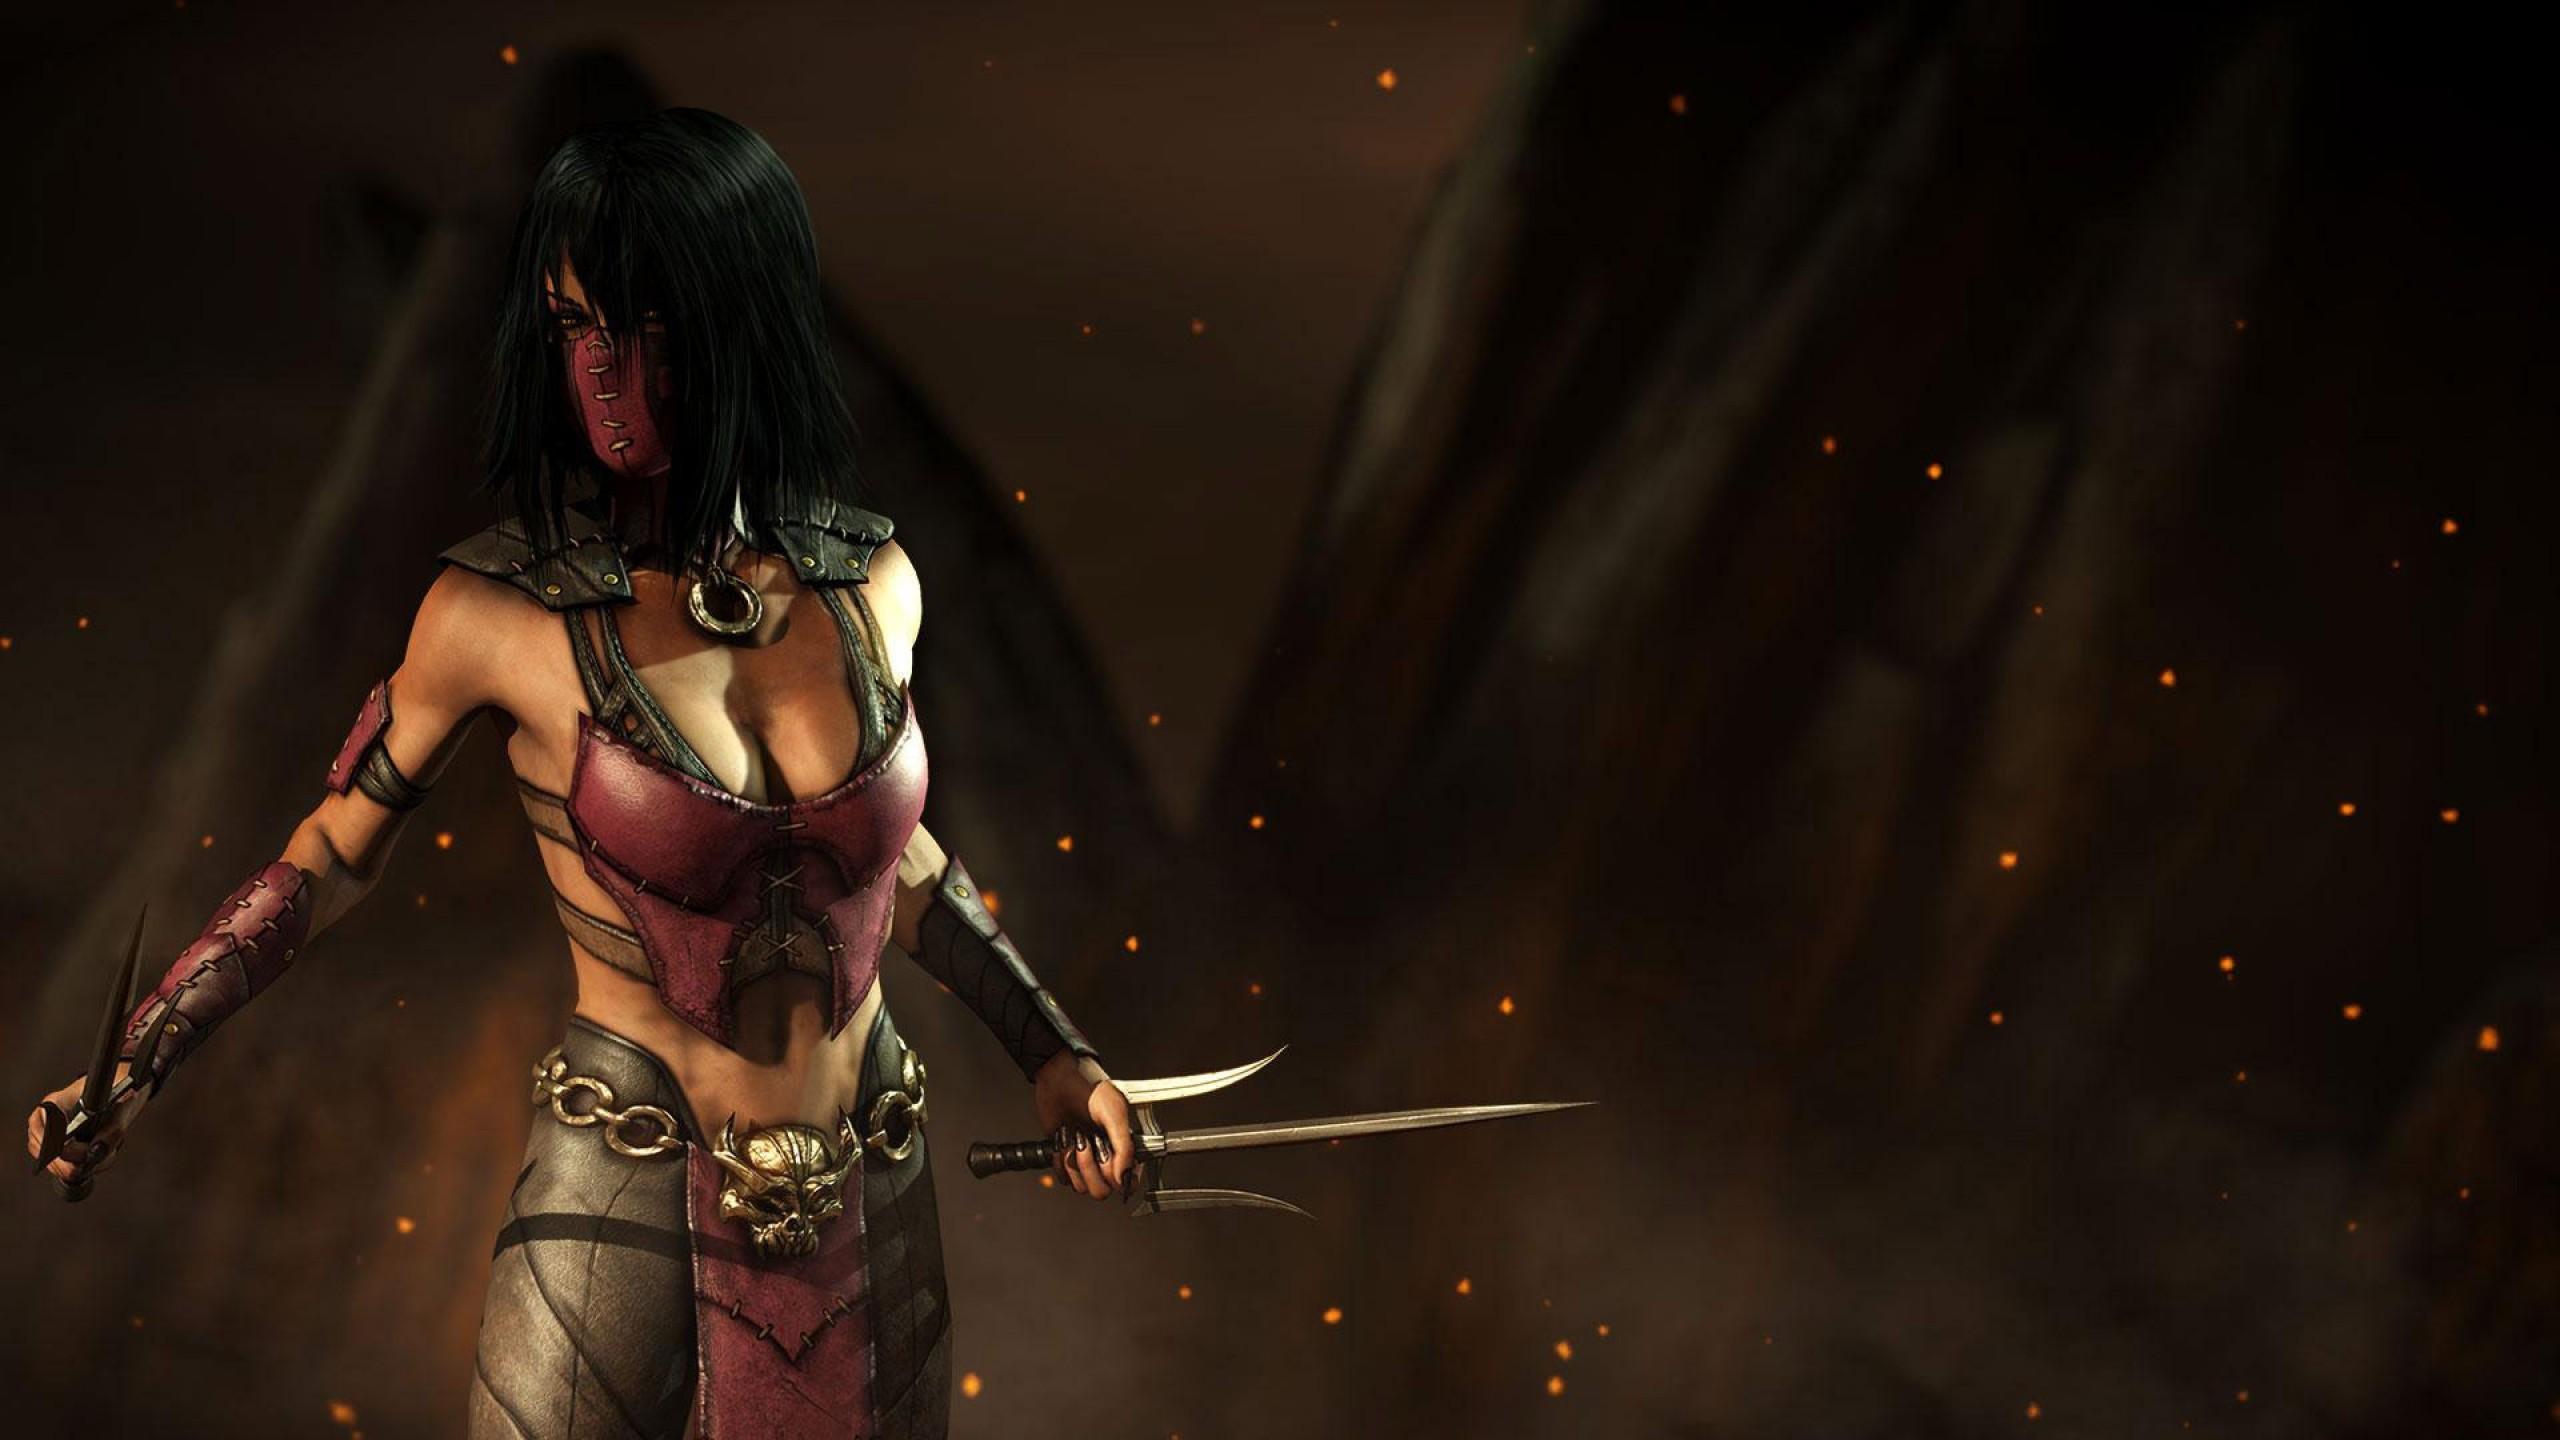 https://www.123wallpapershd.com/preview/3960/2560×1440/ · Mortal Kombat XHd  Wallpaper